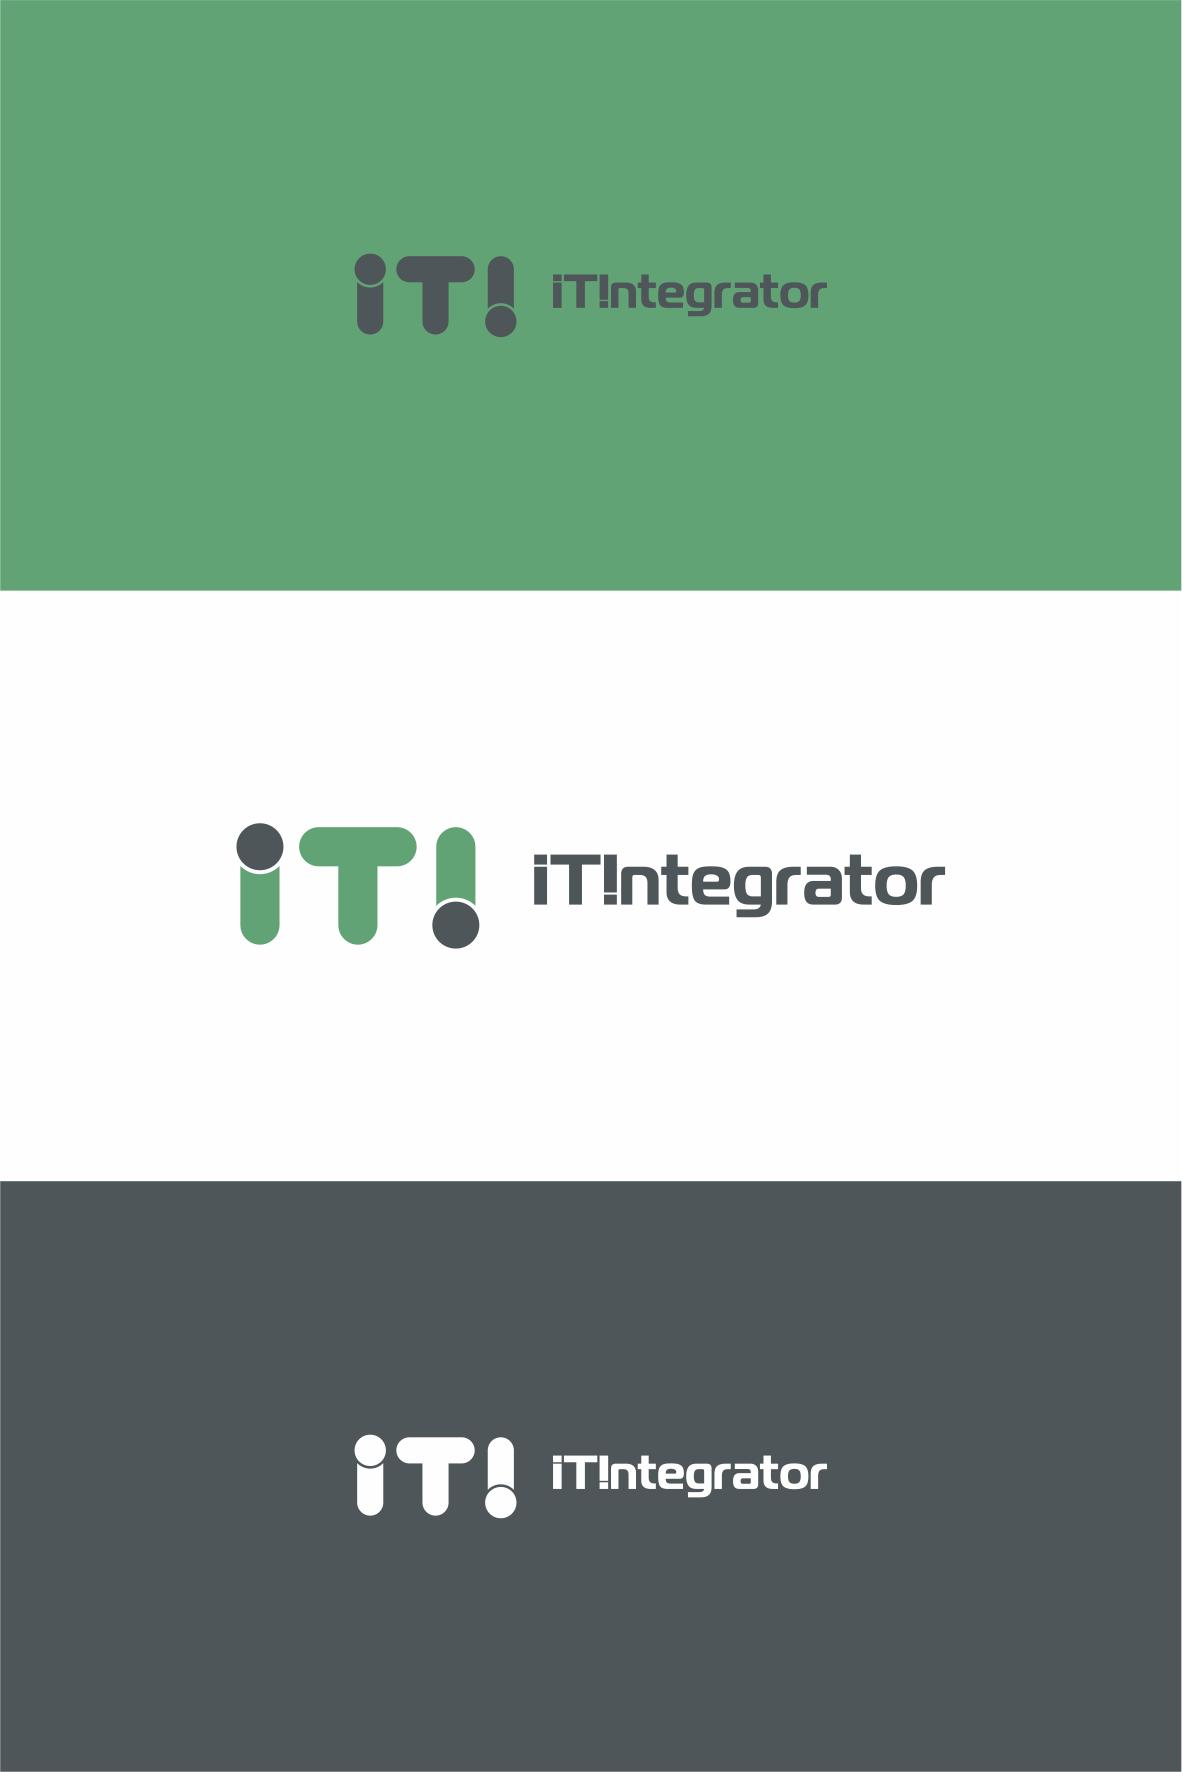 Логотип для IT интегратора фото f_957614c35da7acbe.png